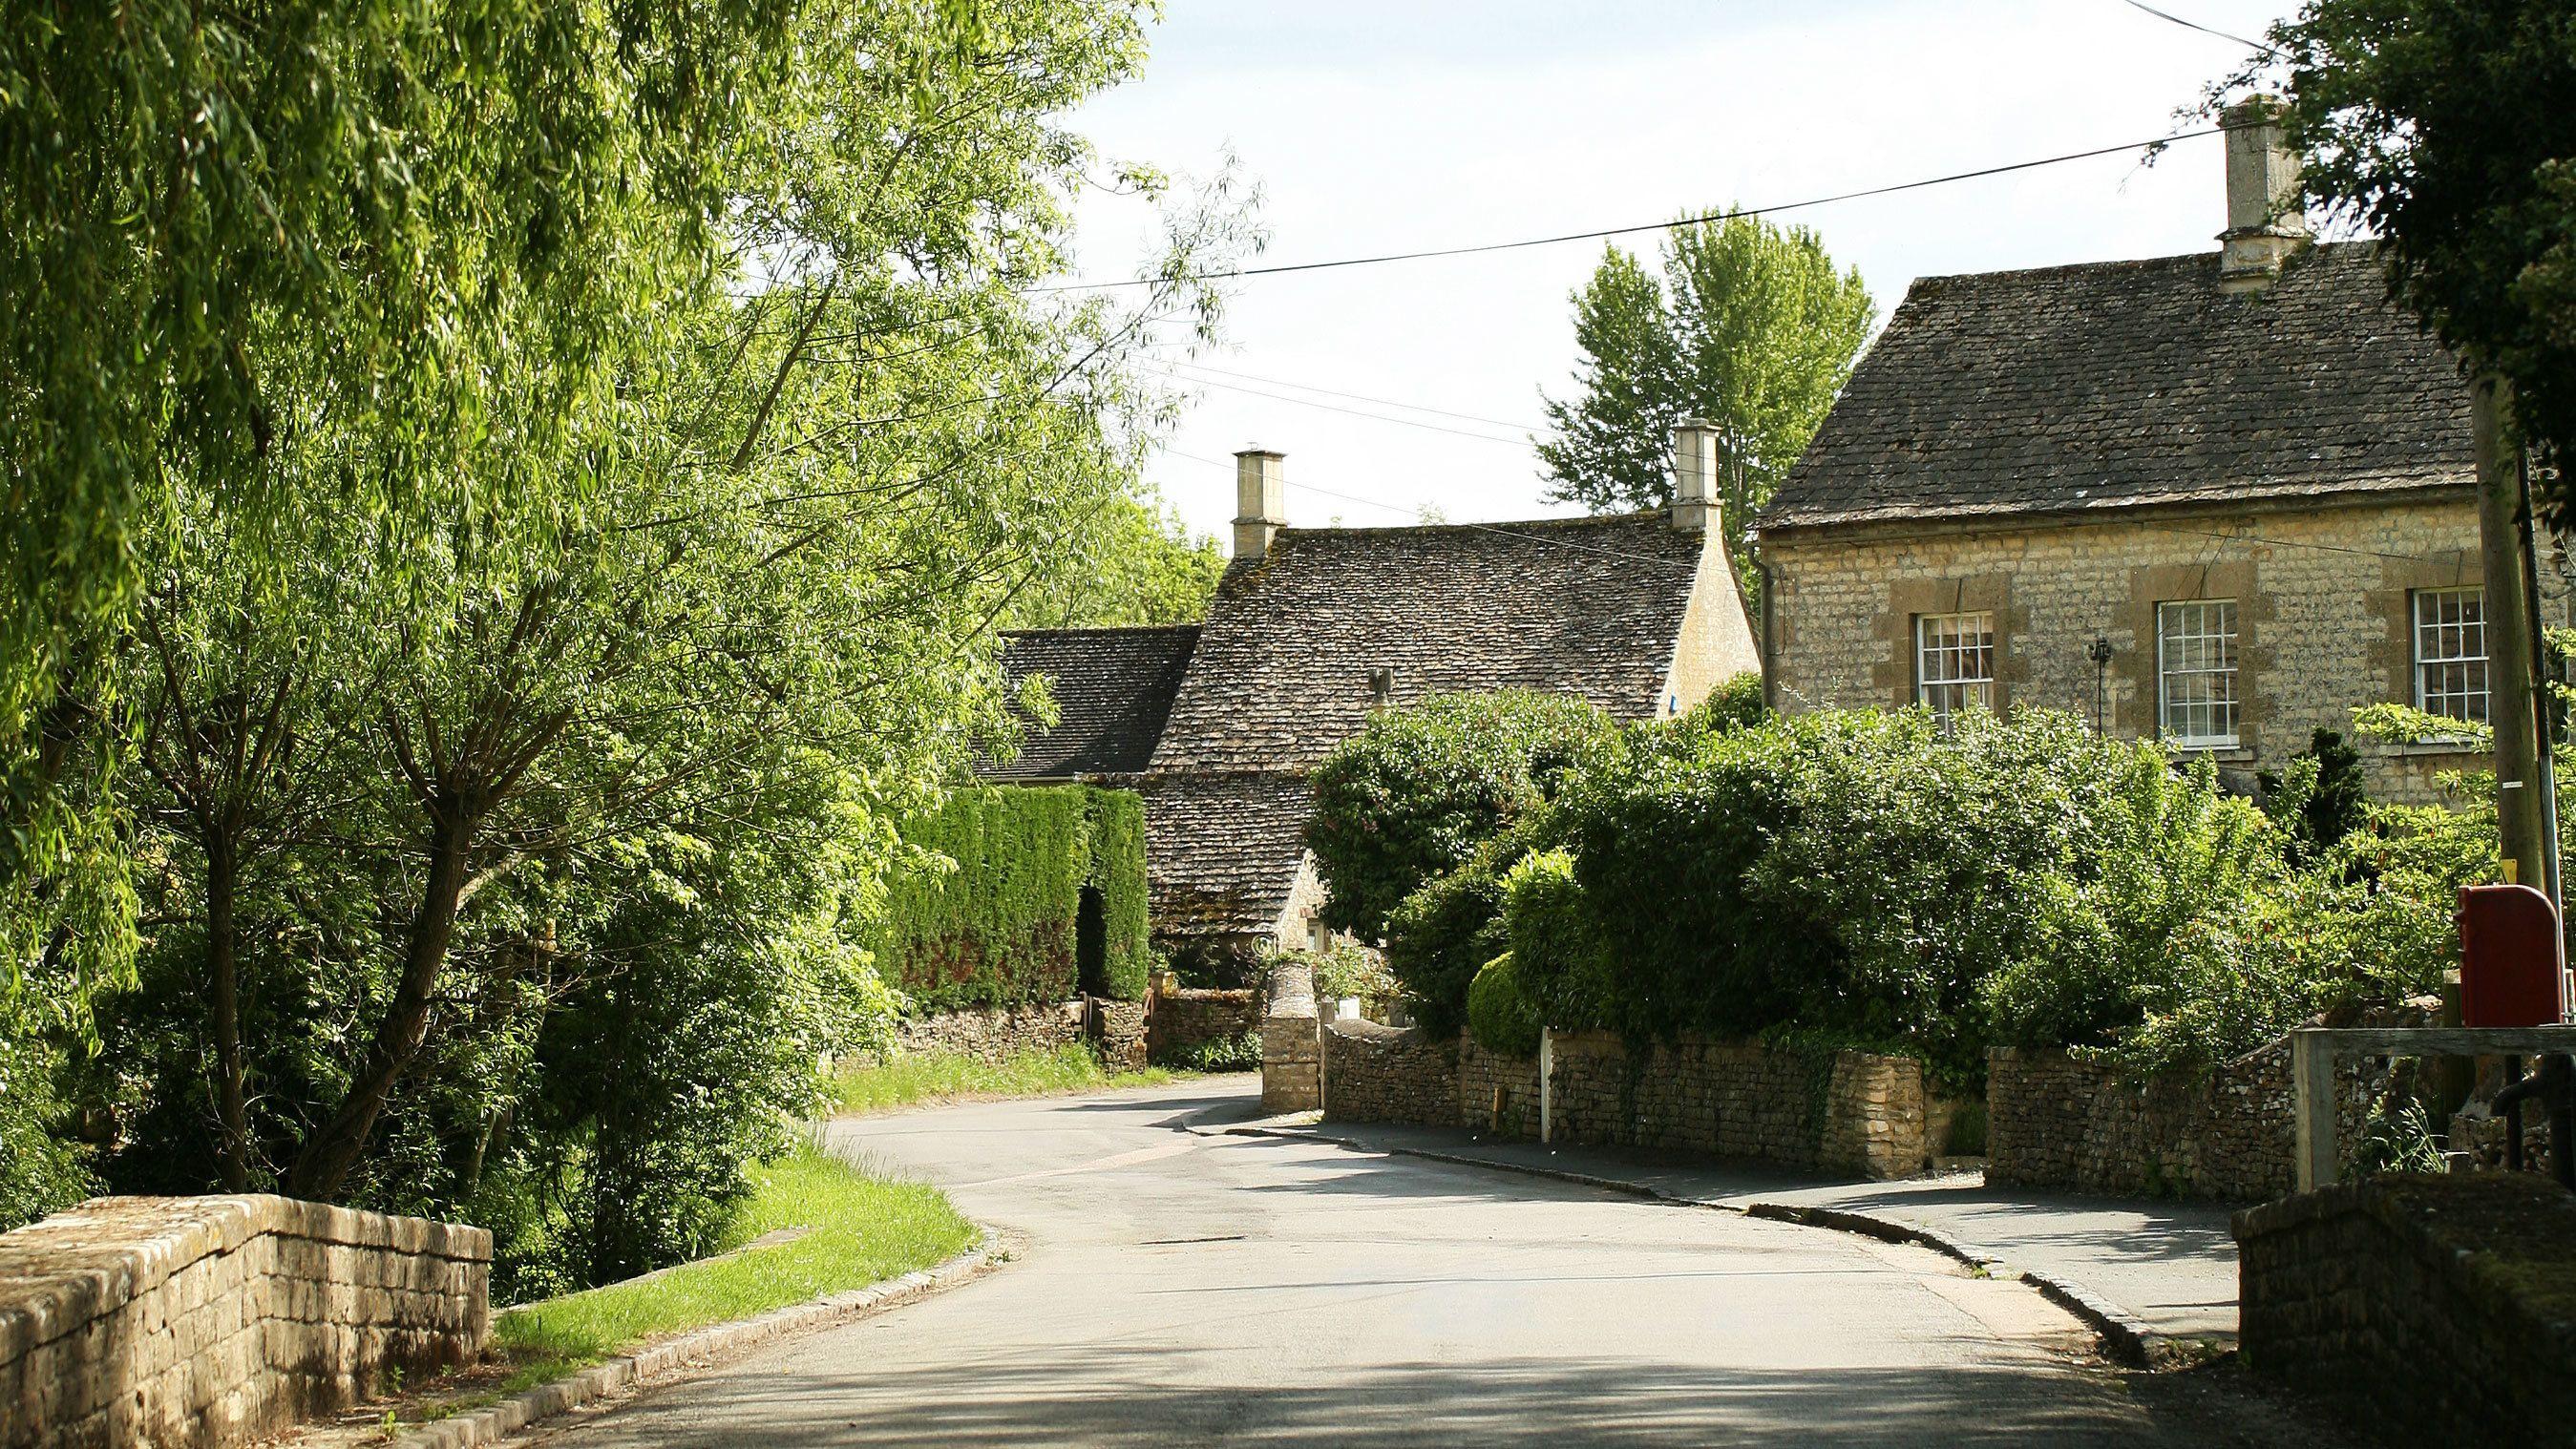 Winding street of Shilton